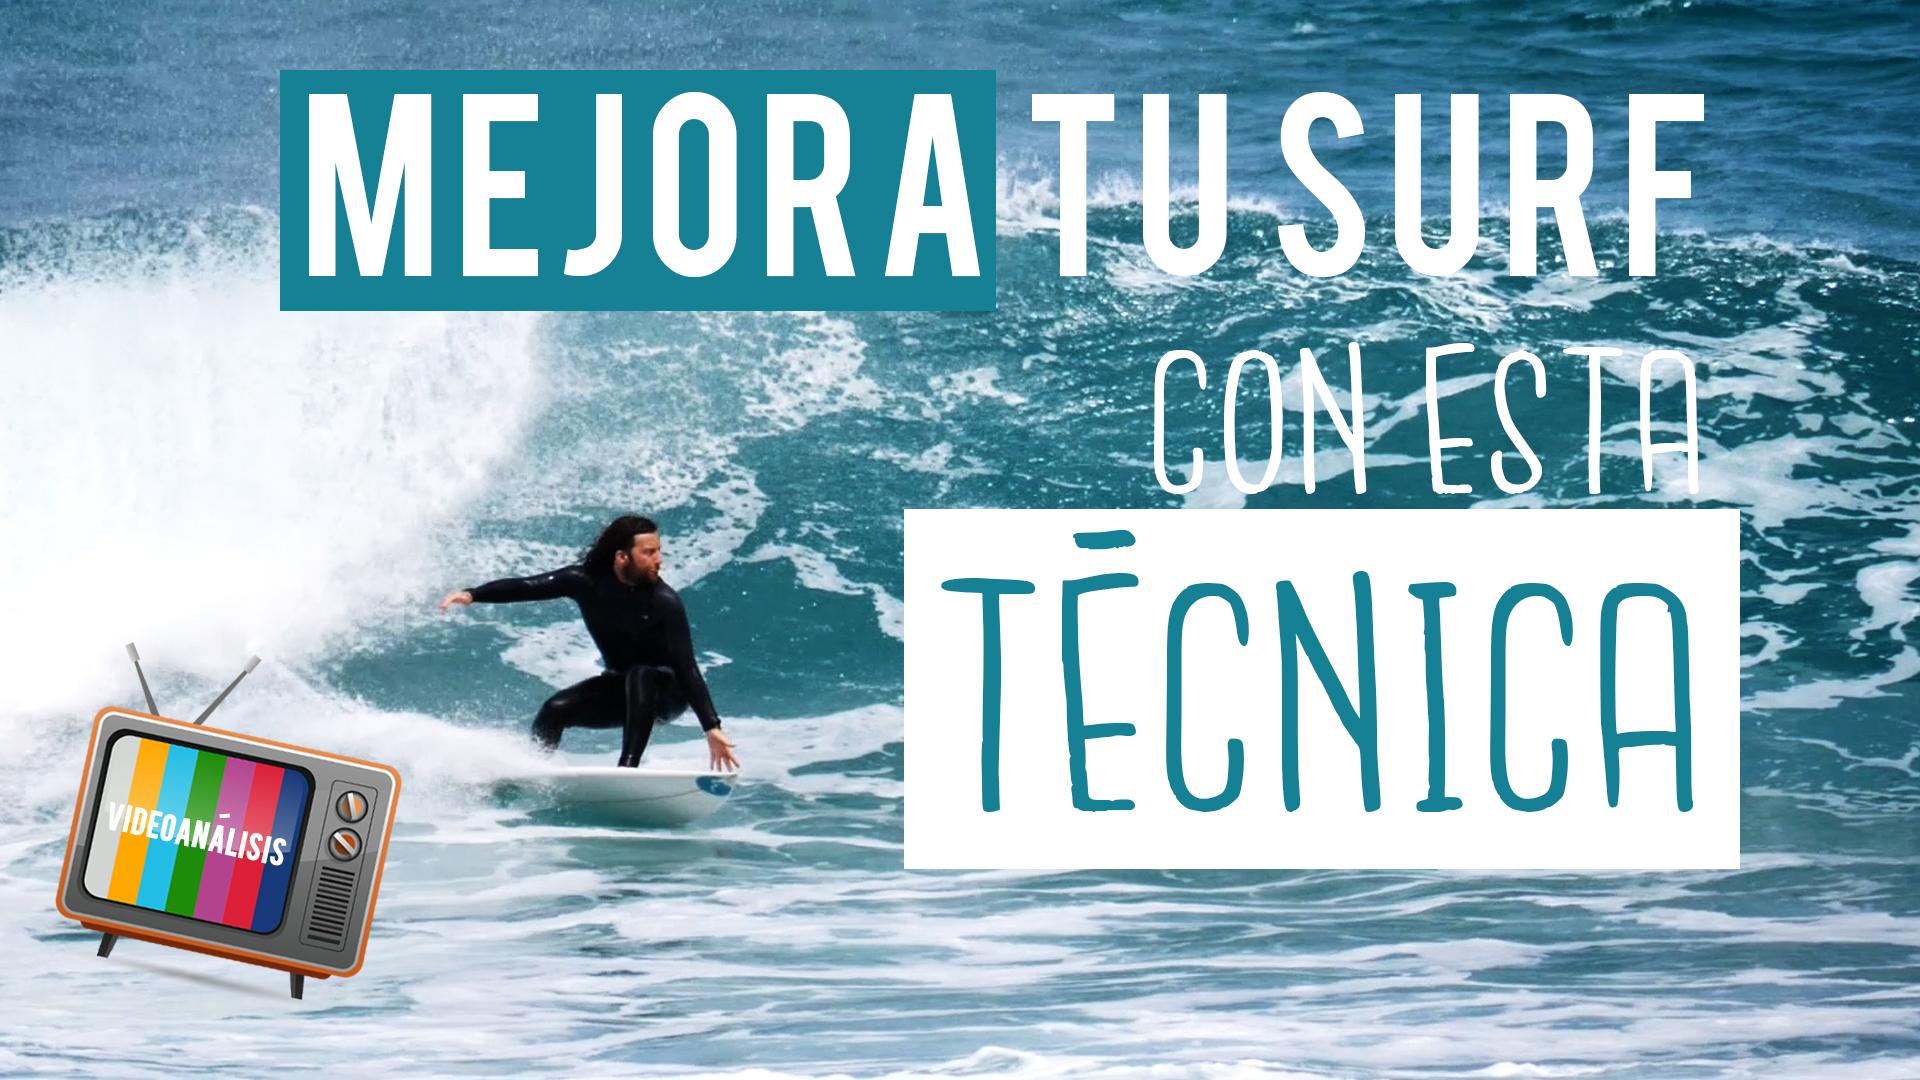 Videoanálisis surf coaching en español